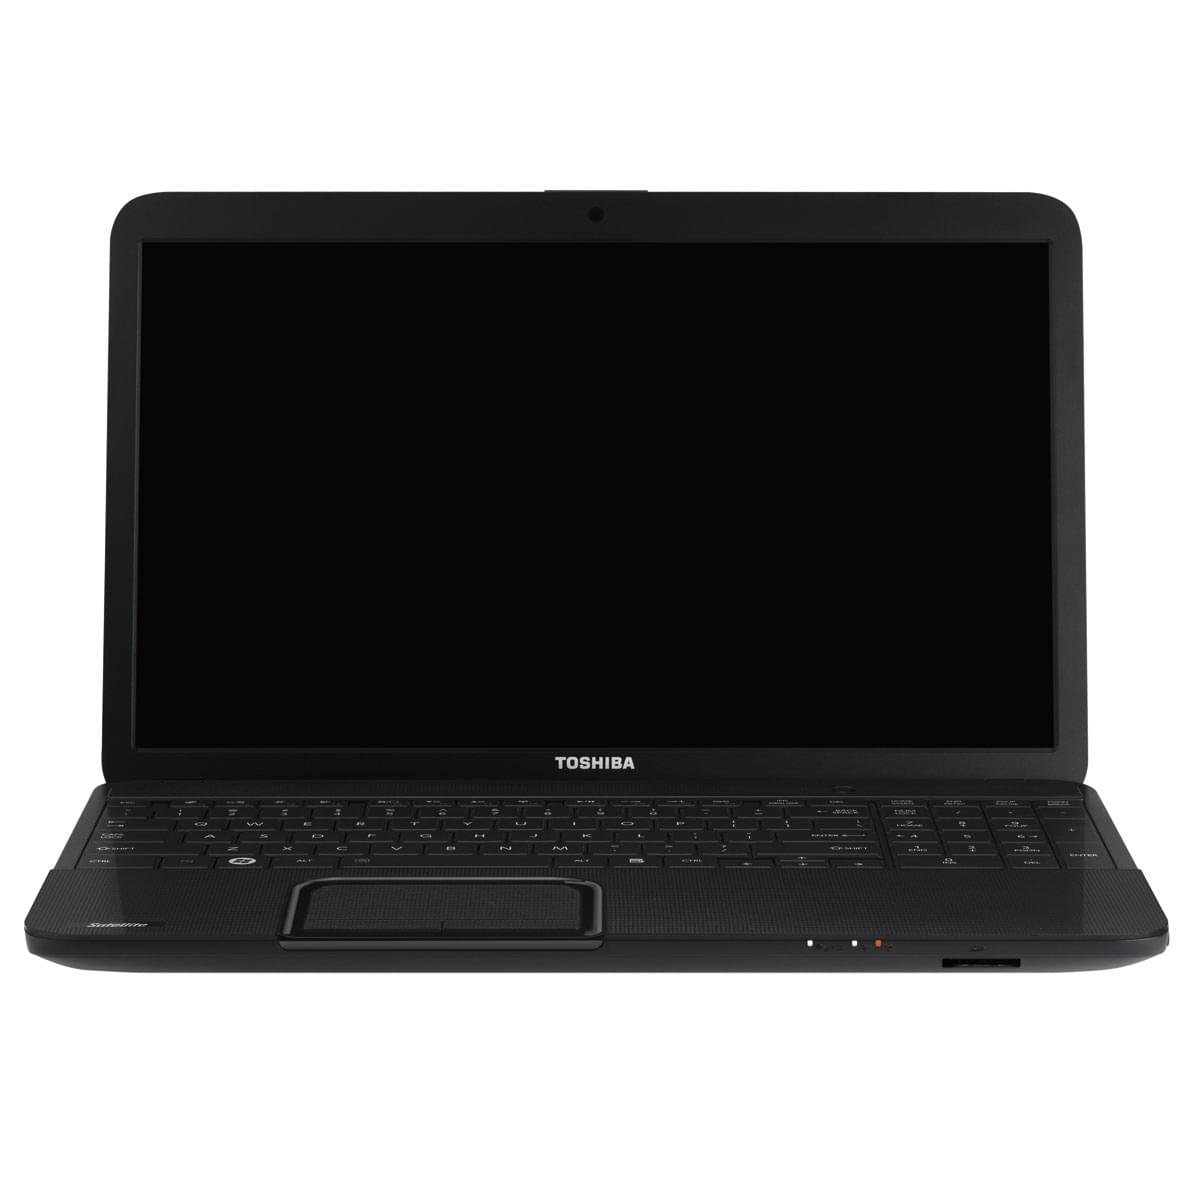 Toshiba PSC9SE-011003FR - PC portable Toshiba - Cybertek.fr - 0